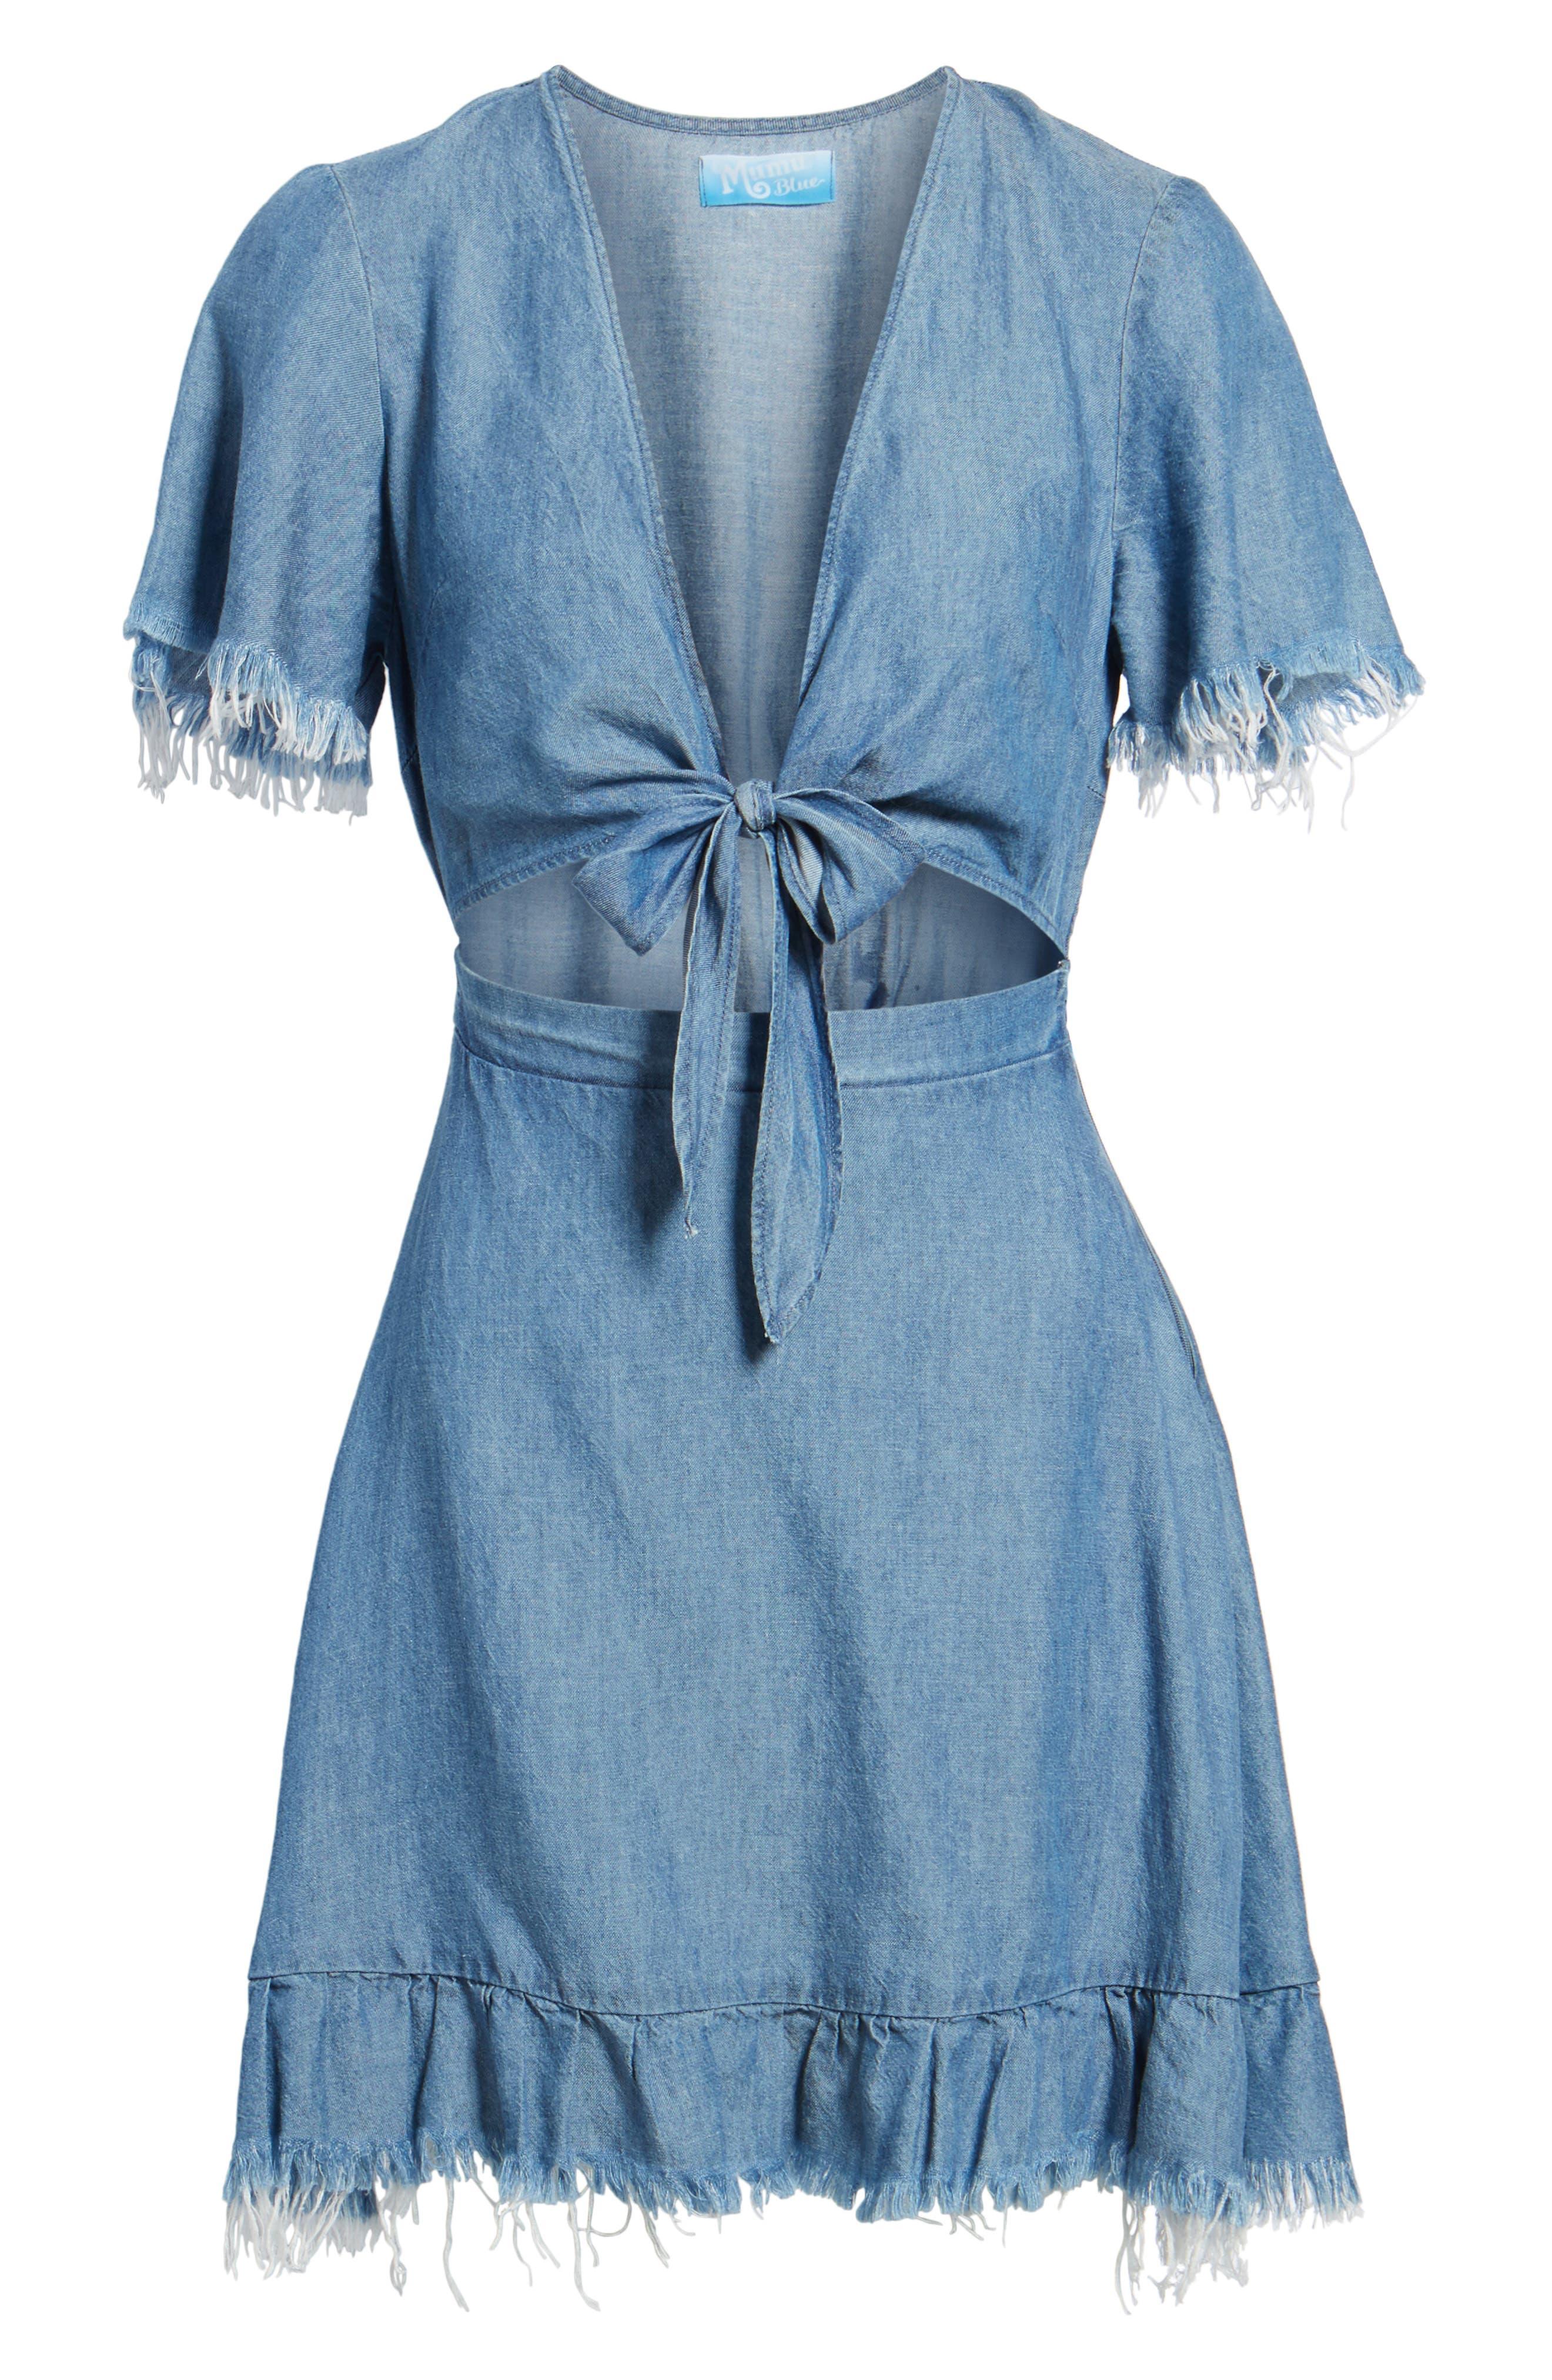 Melanie Ruffle Minidress,                             Alternate thumbnail 6, color,                             400